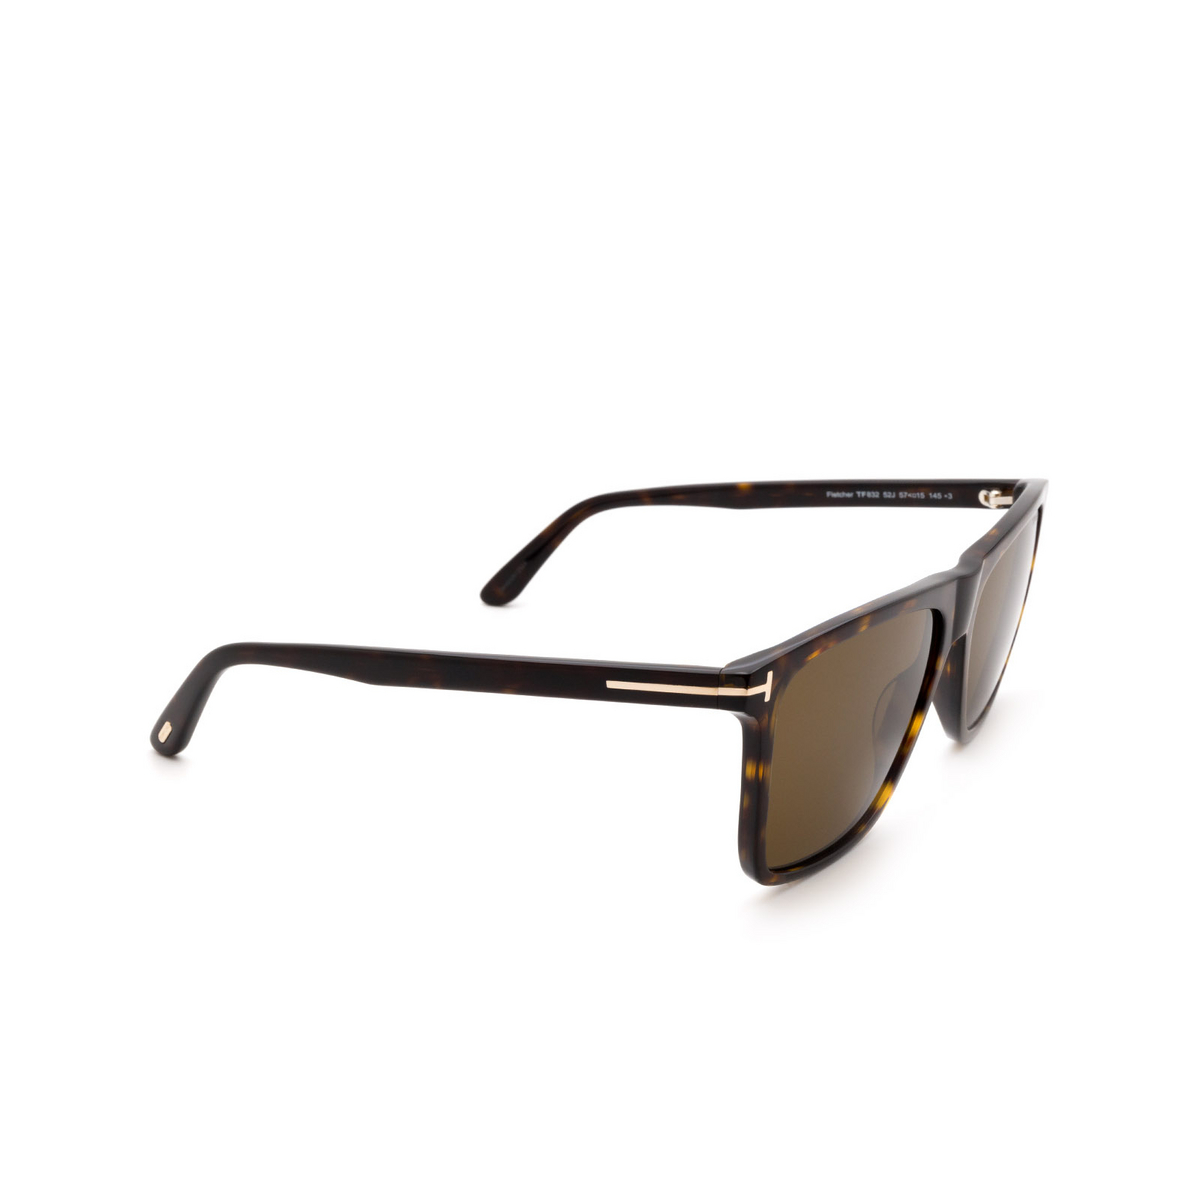 Tom Ford® Square Sunglasses: Fletcher FT0832 color Dark Havana 52J - three-quarters view.